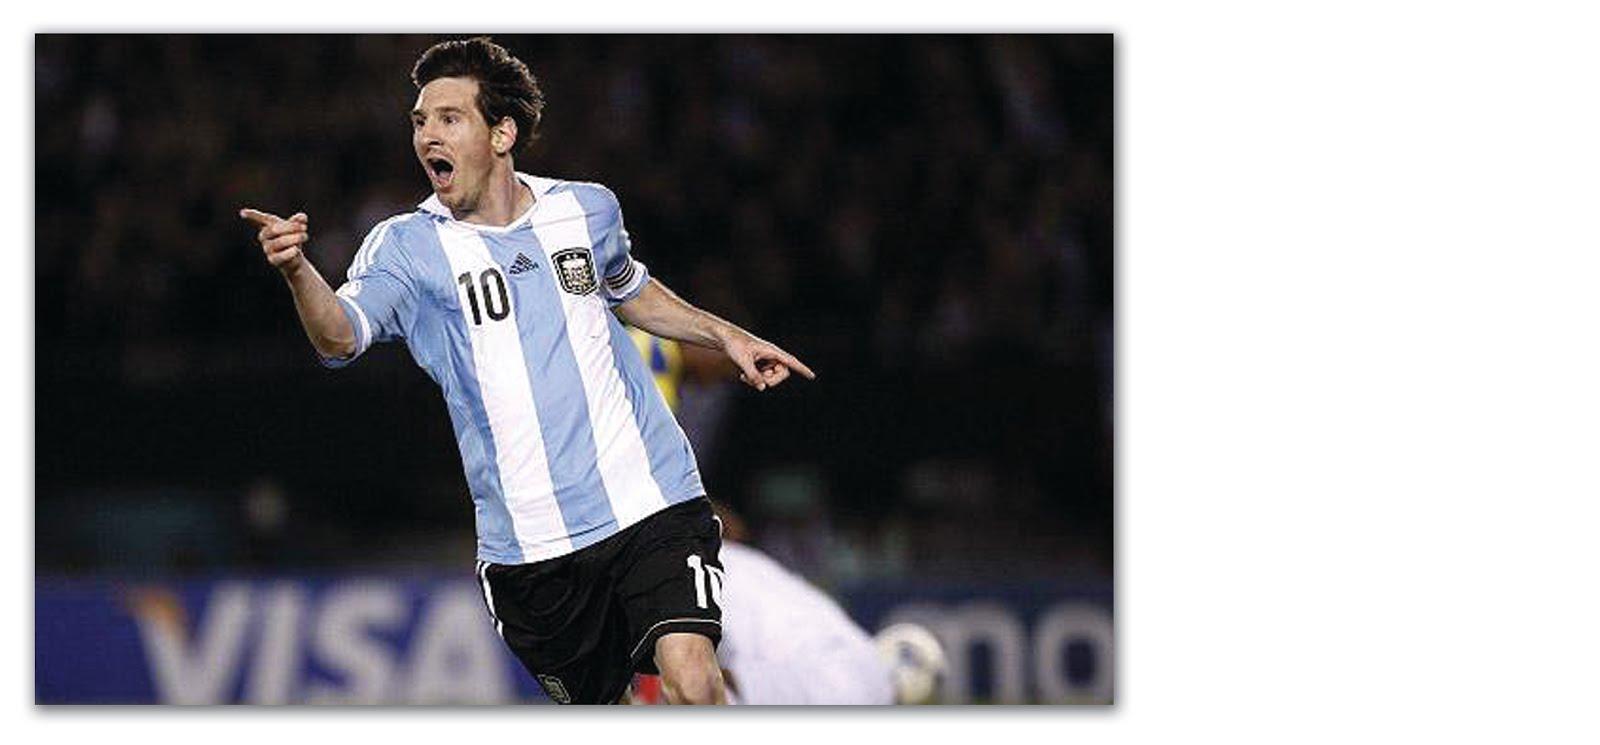 diego maradona playing style - photo #12